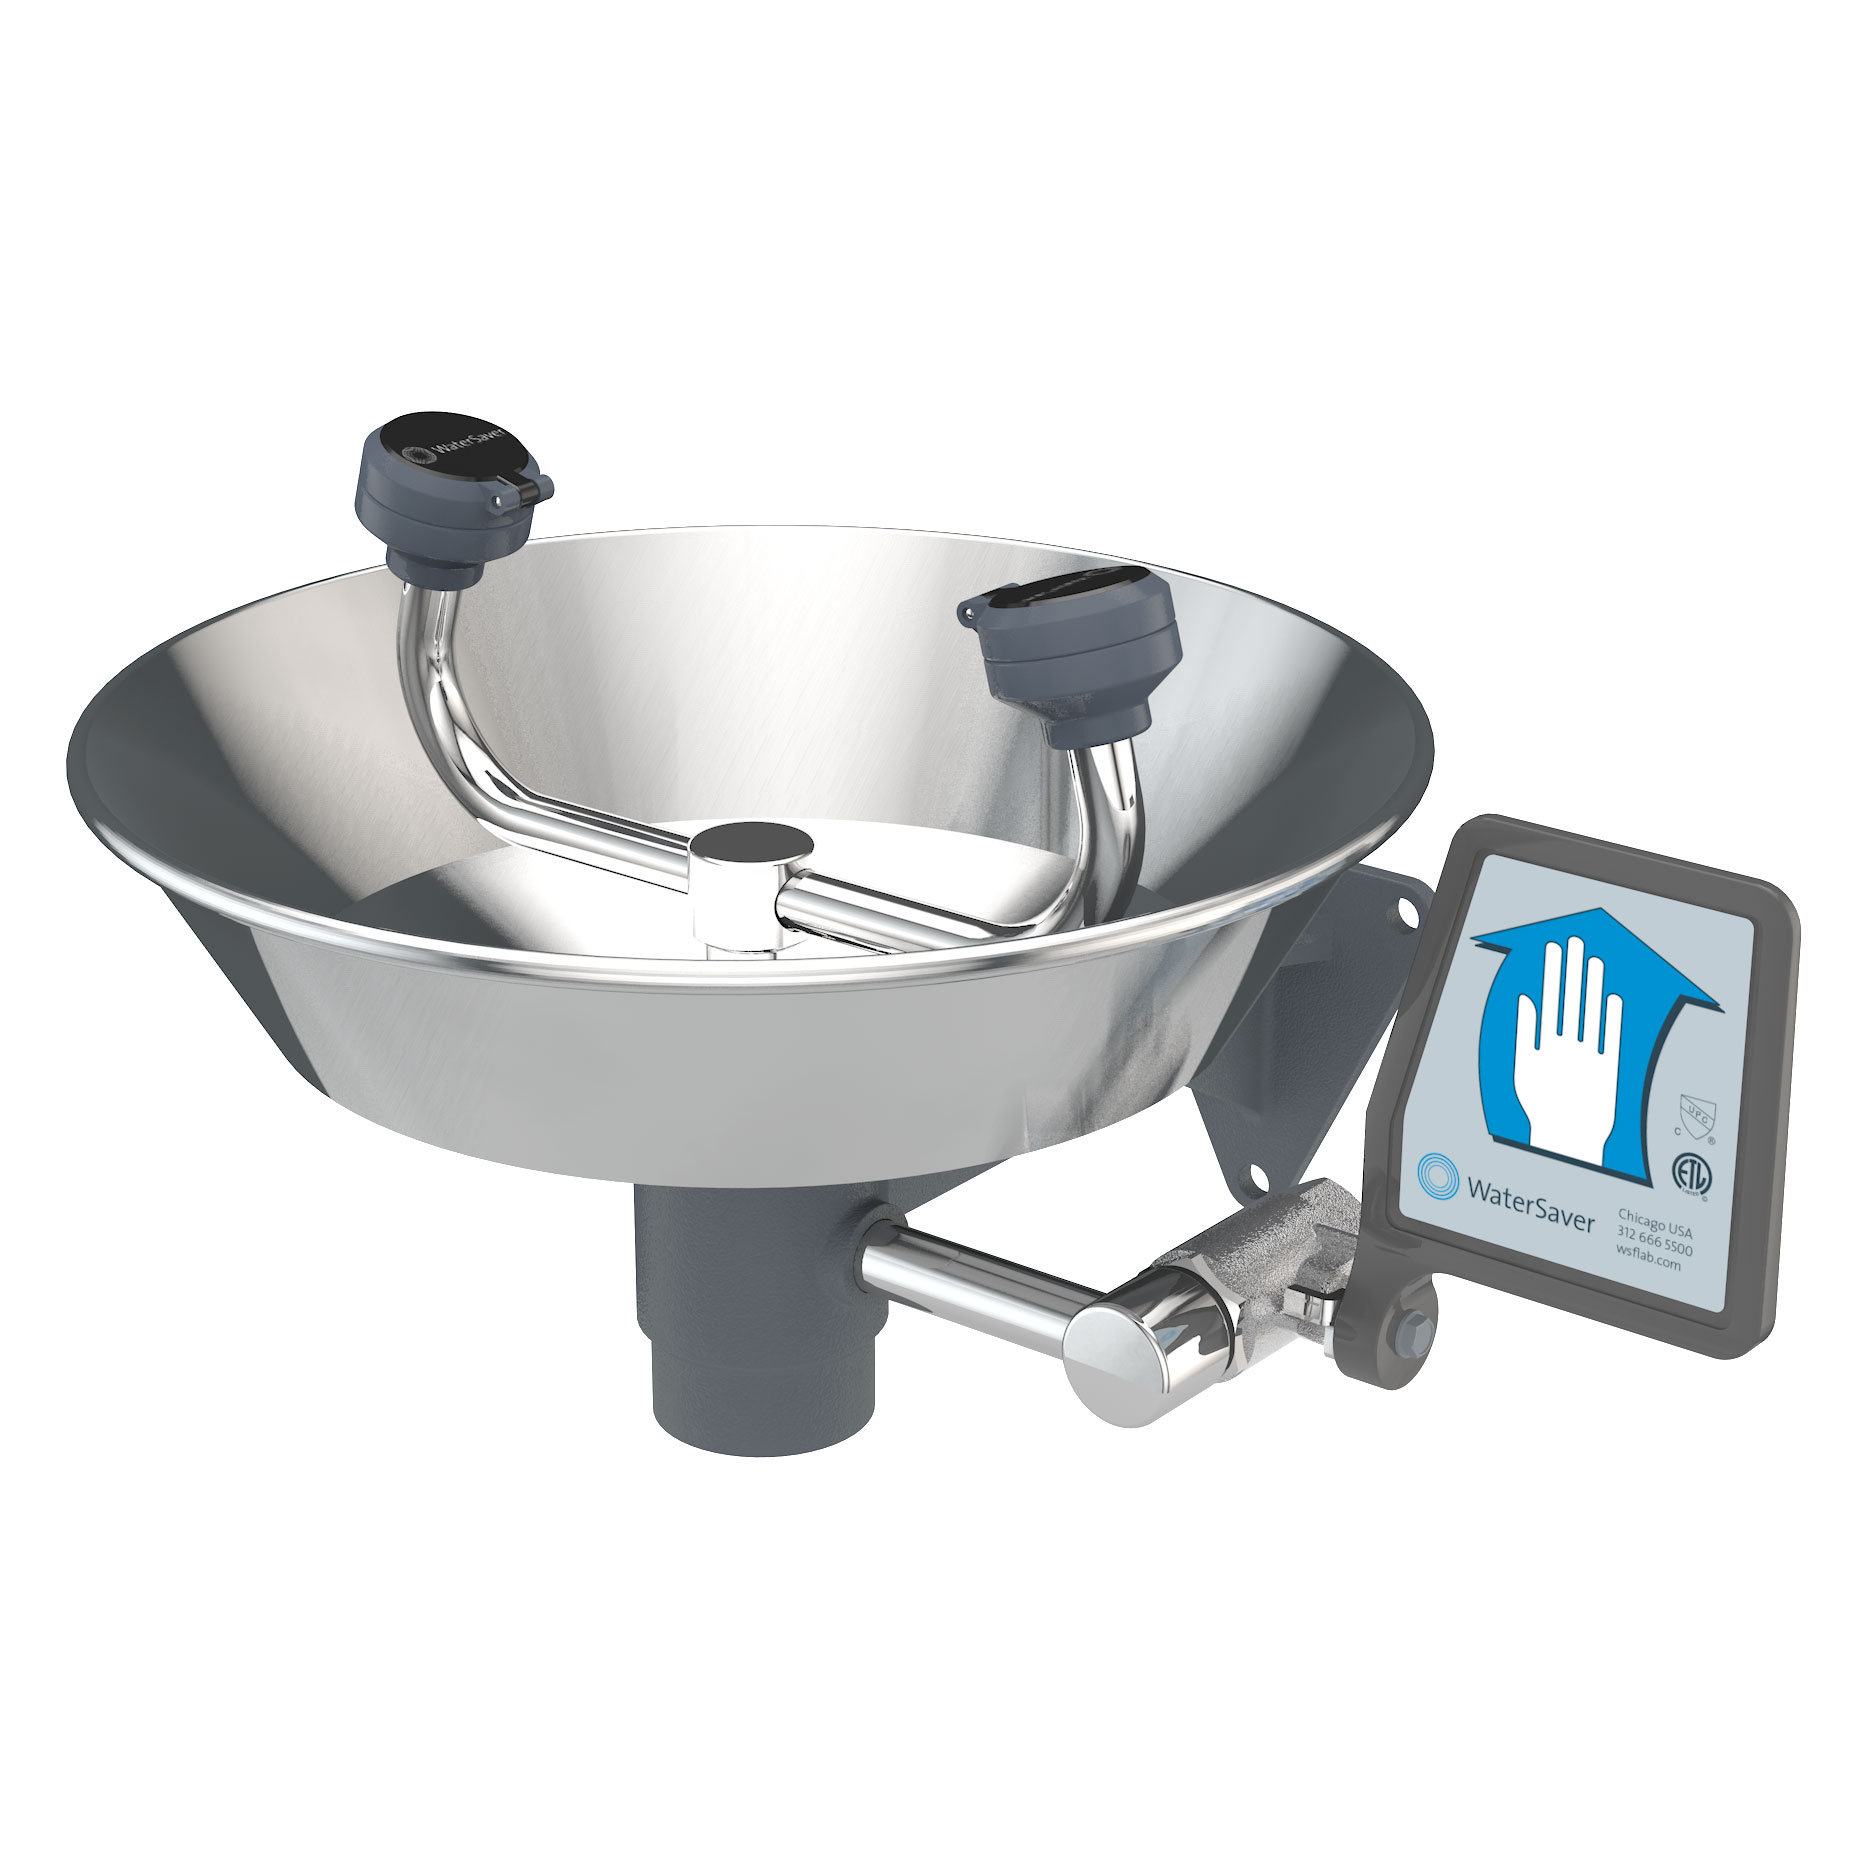 ew814 watersaver faucet co